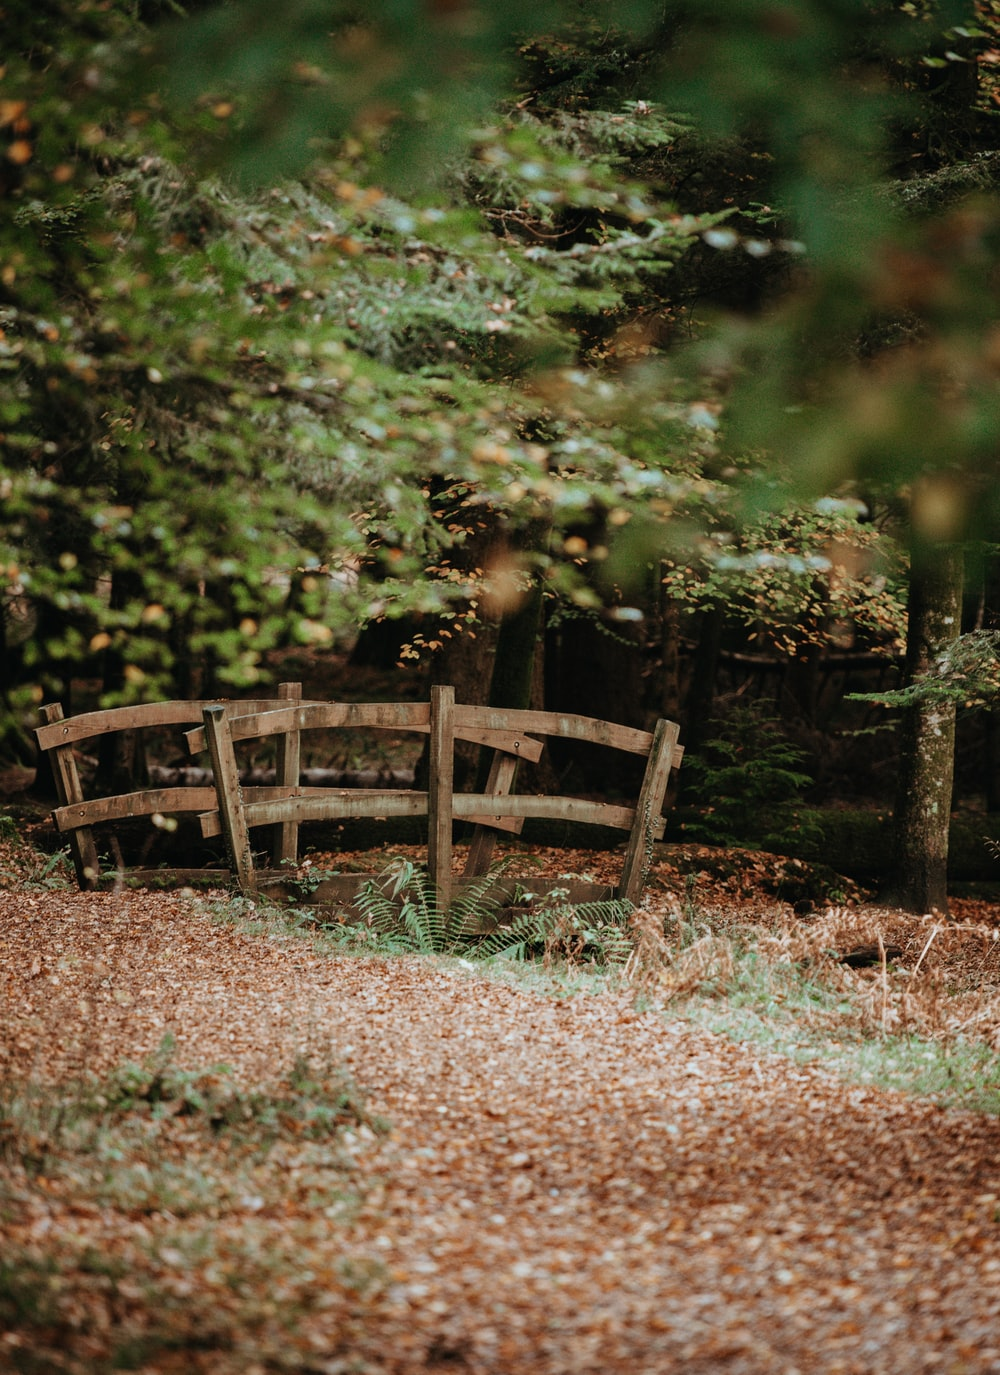 brown bridge near trees